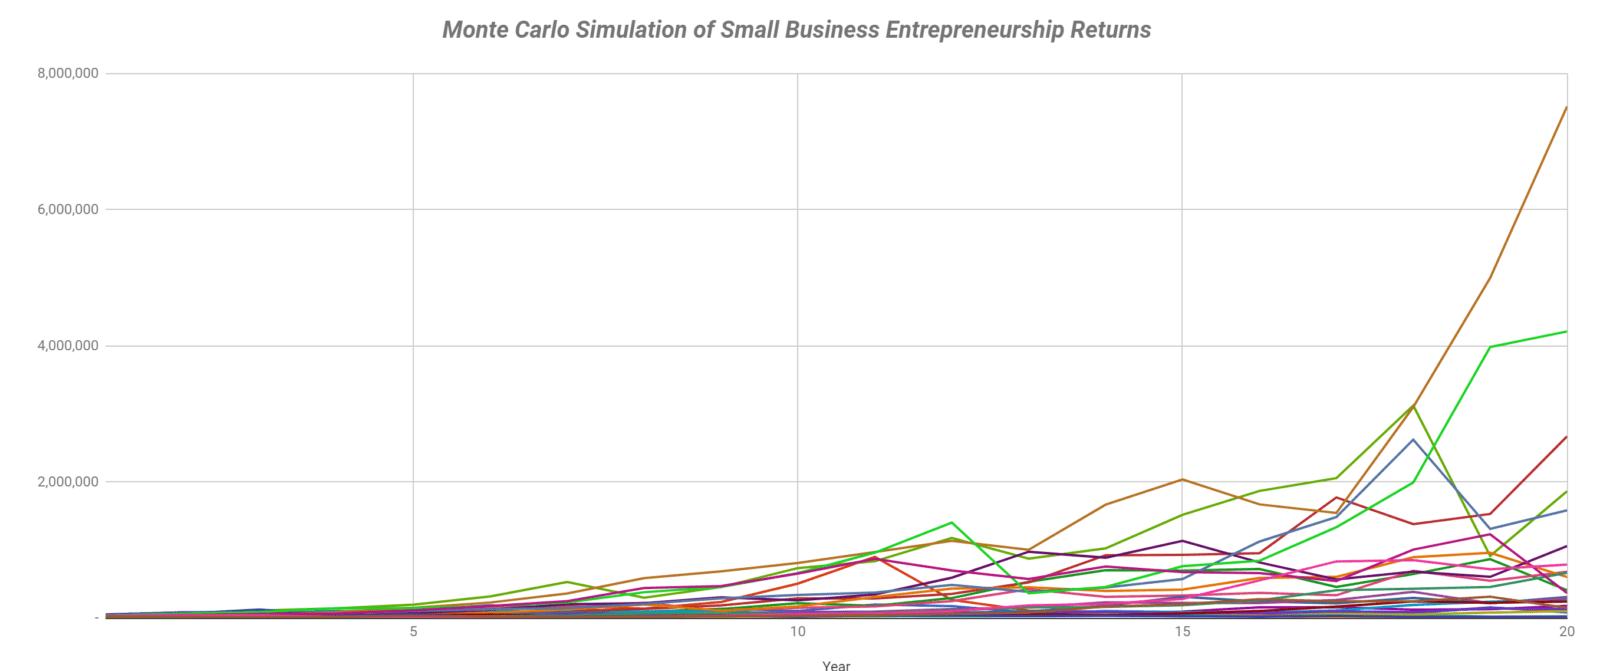 Small Business Monte Carlo Simulation